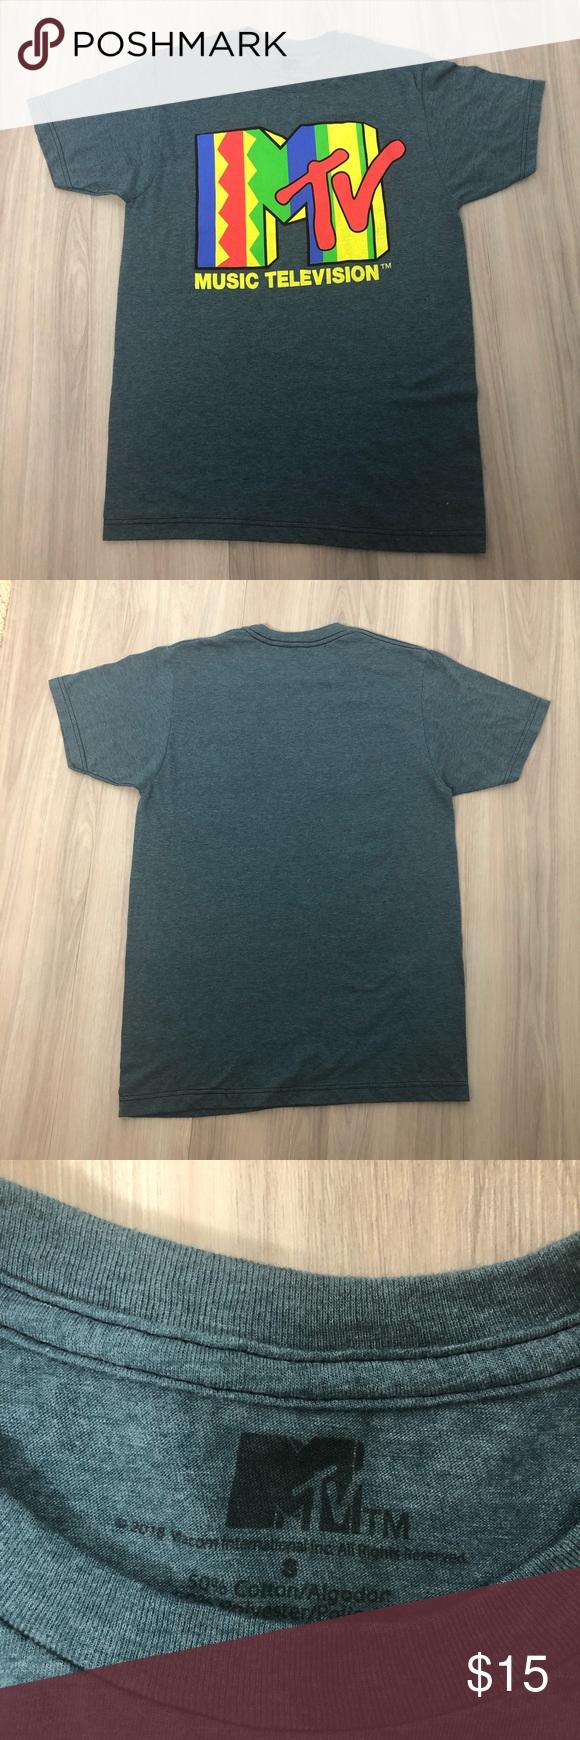 MTV Gray T-shirt with mtv logo, size S